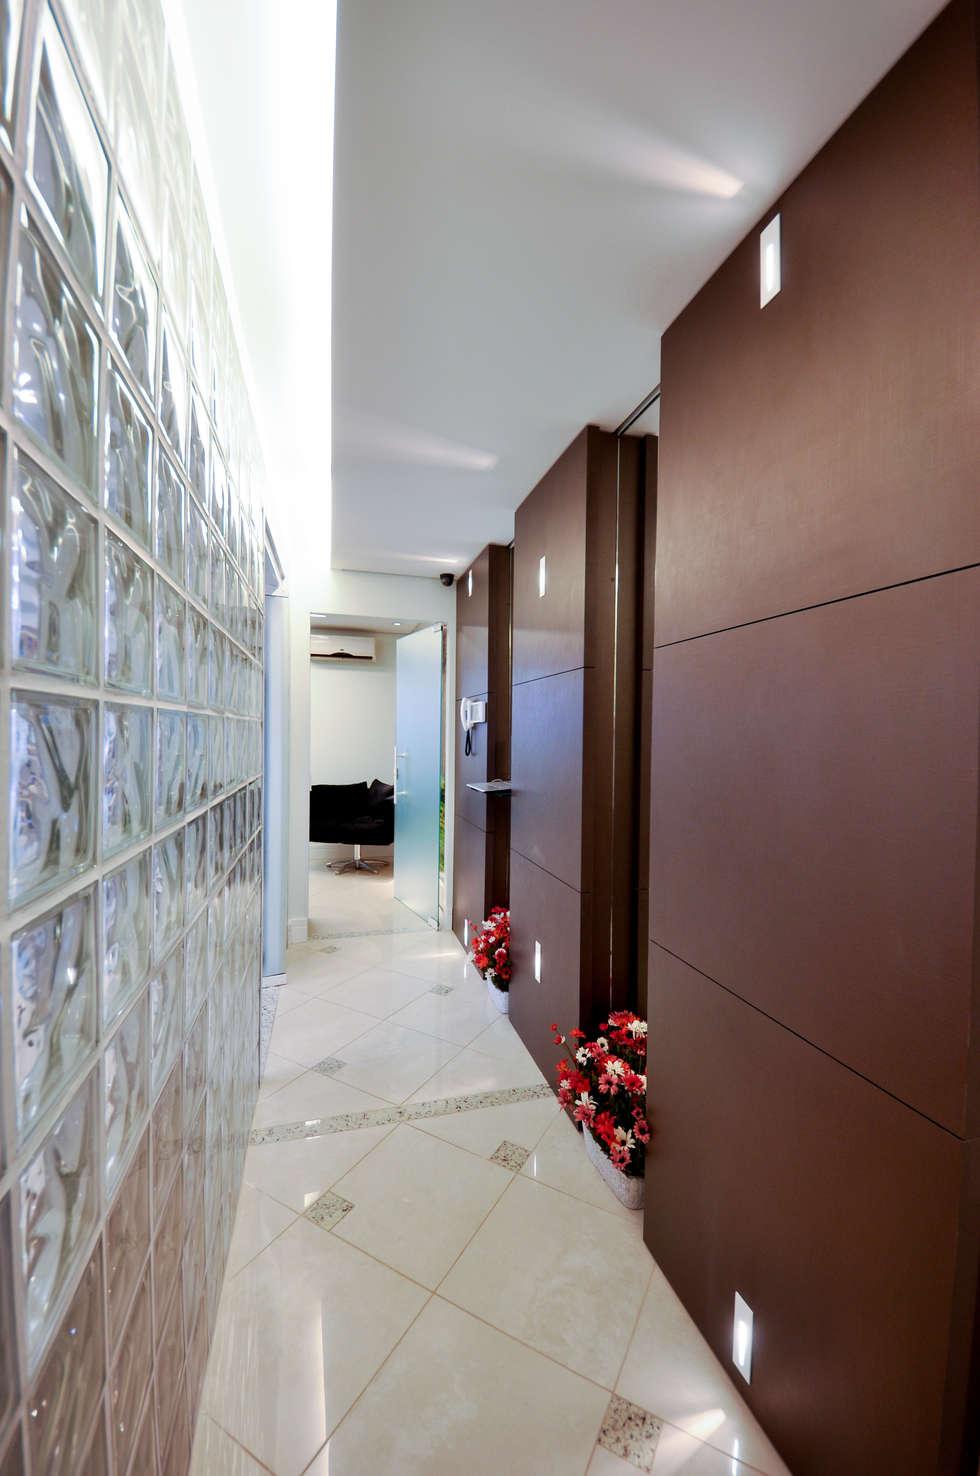 JARDIM ODONTOLOGIA: Clínicas  por Veridiana Negri Arquitetura